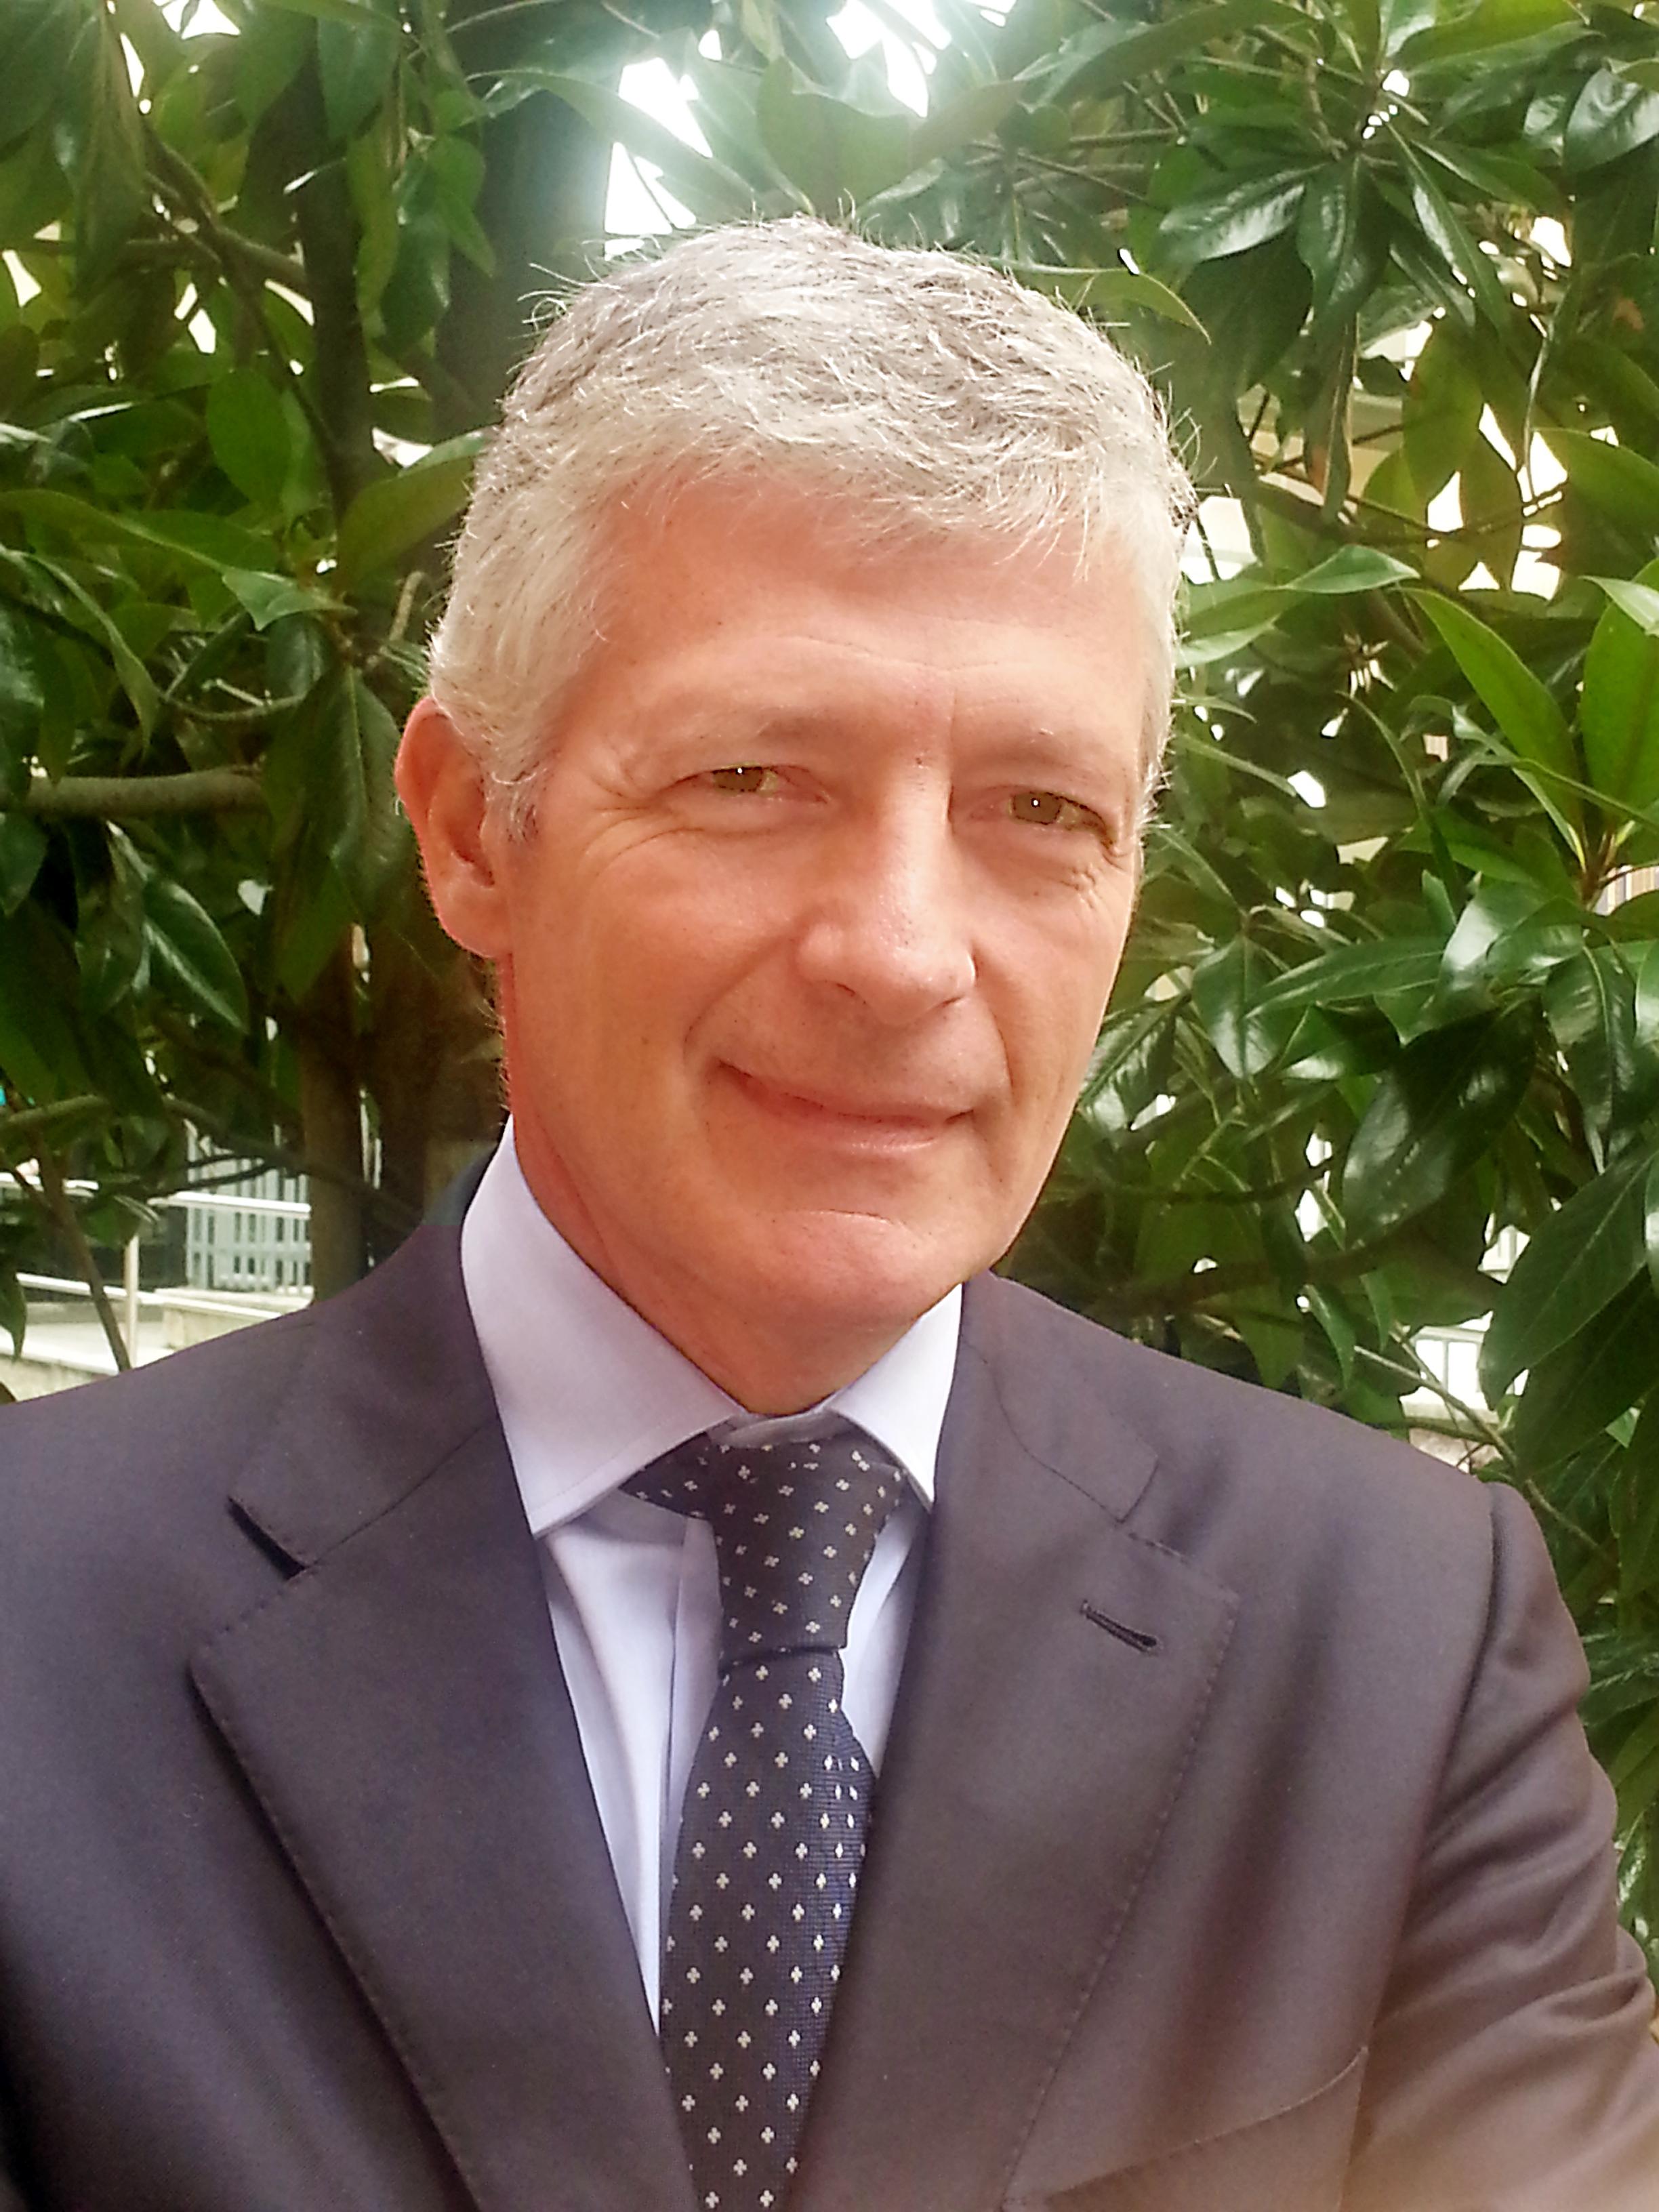 Dott. Federico Vignati